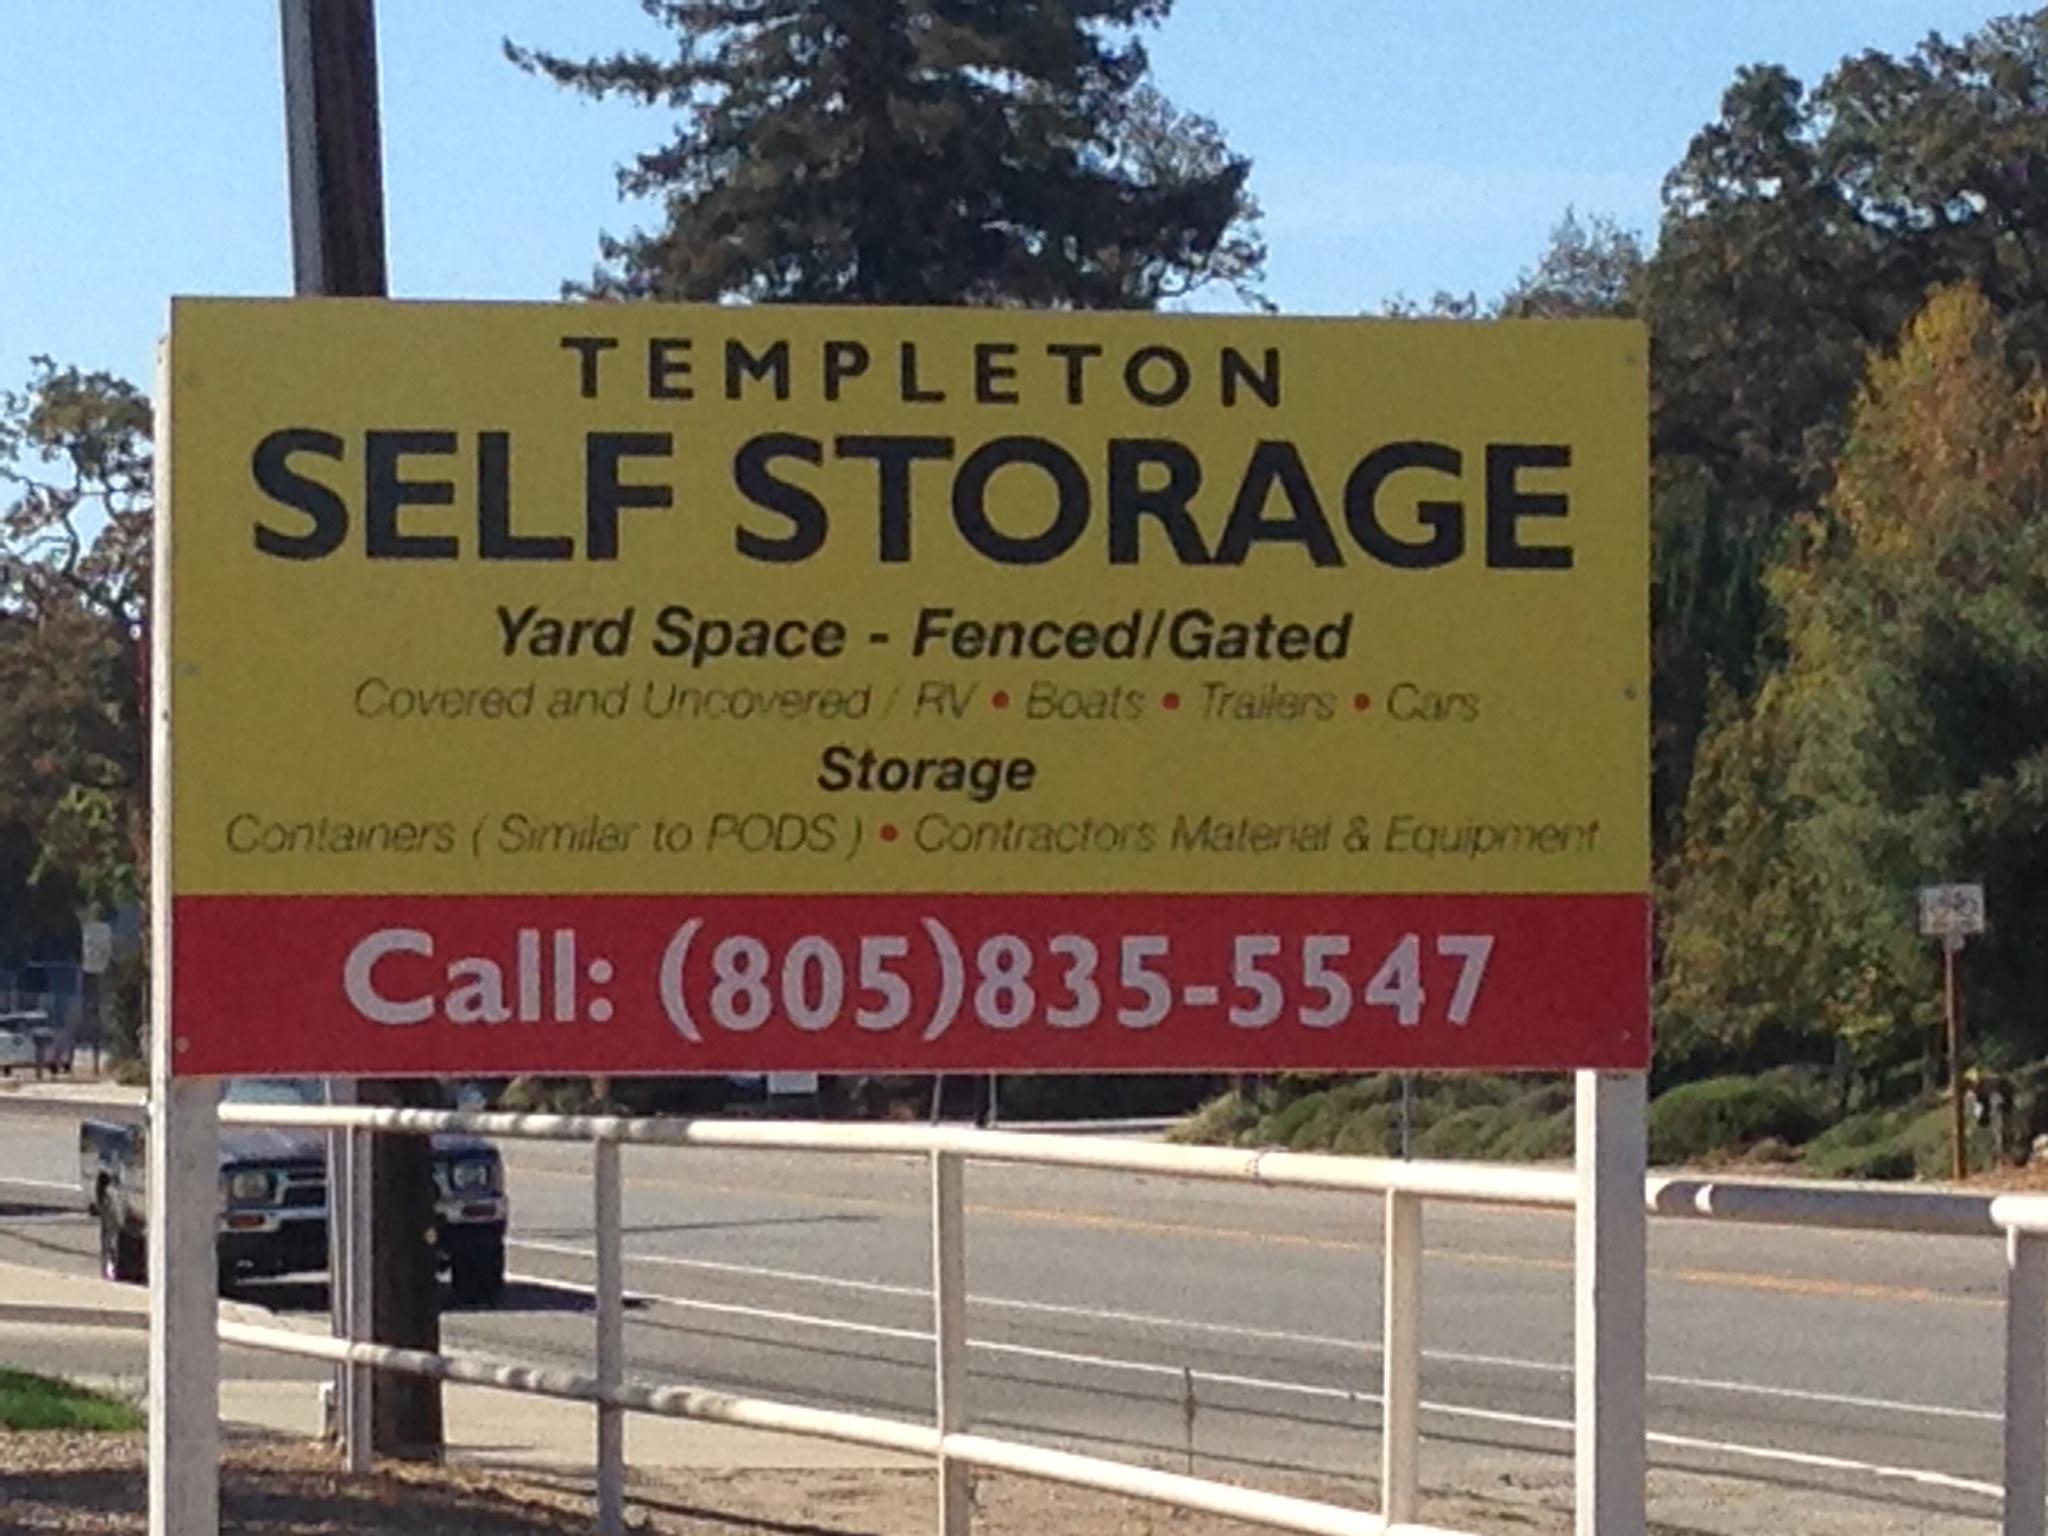 Templeton Self Storage Paso Robles Daily News